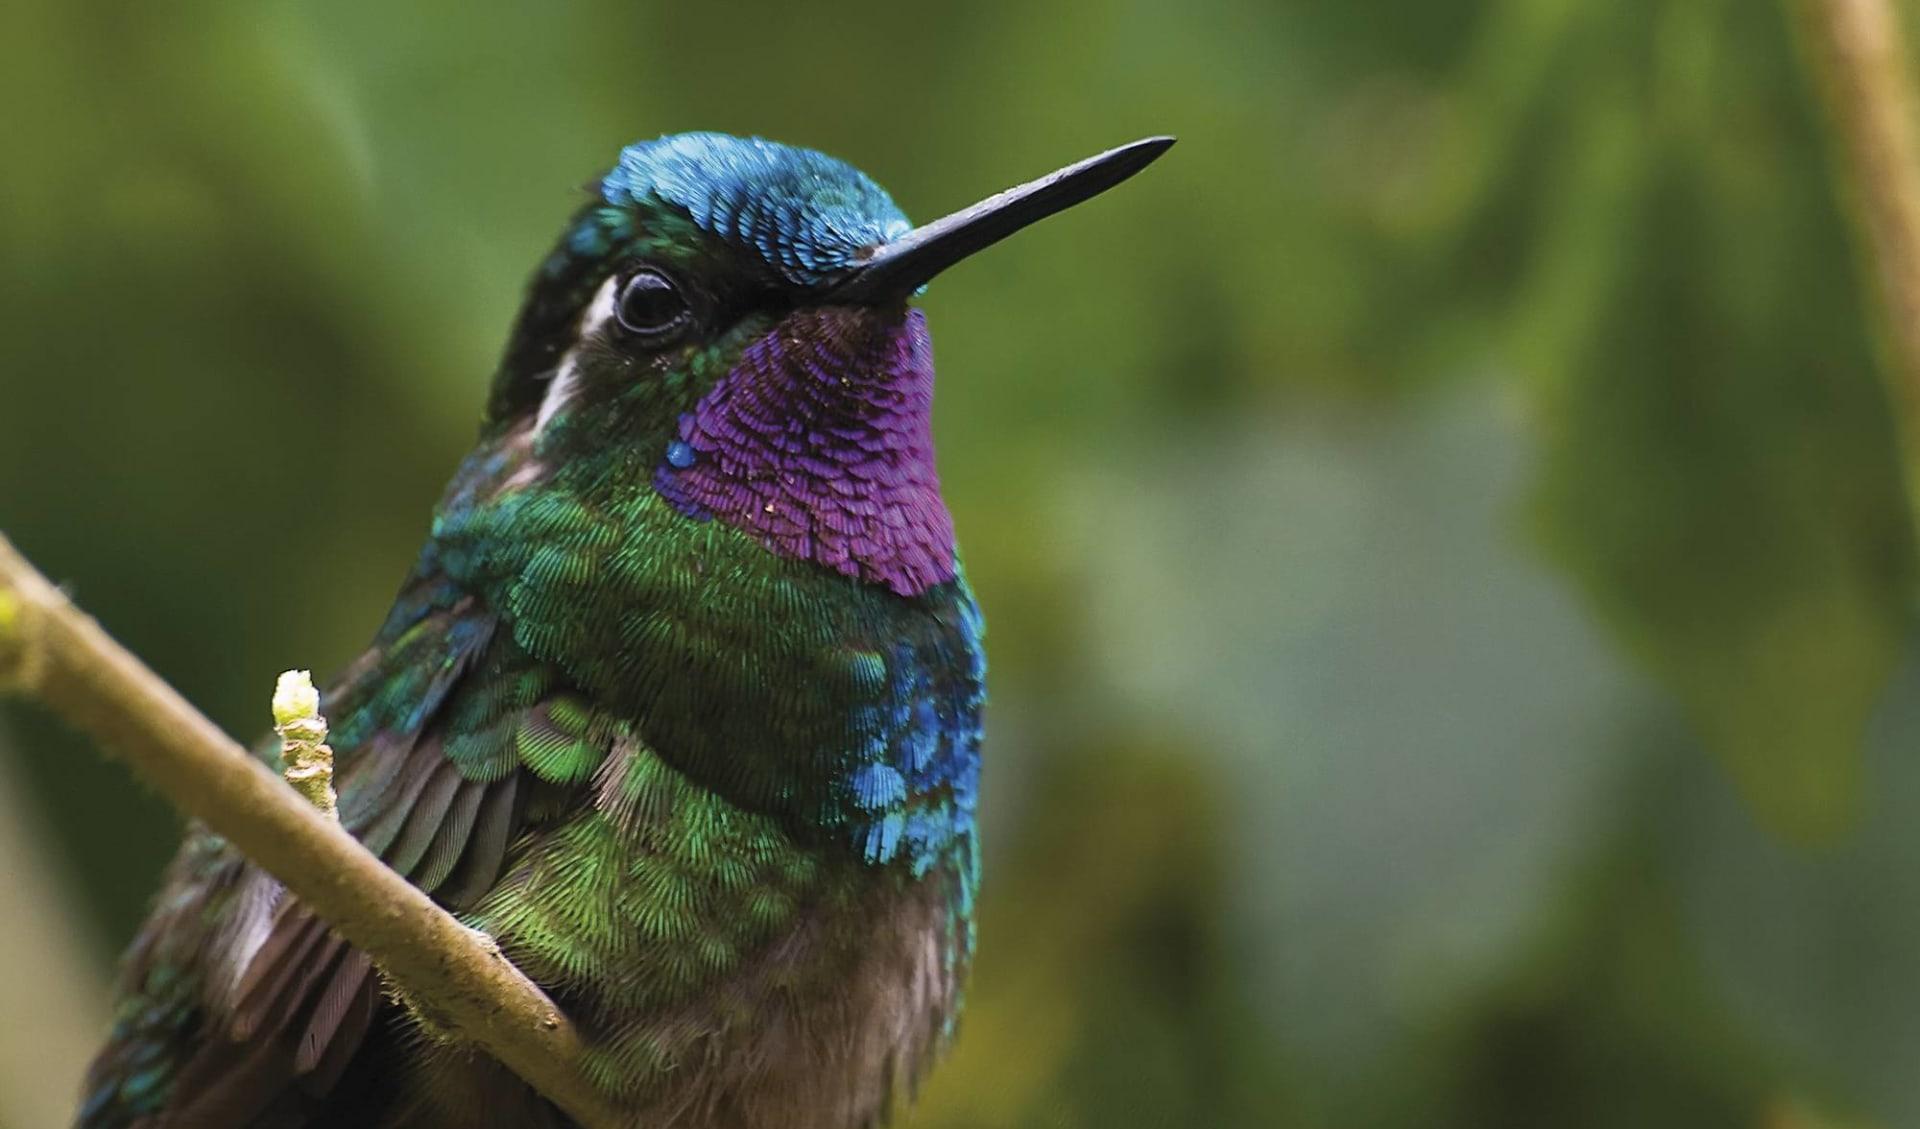 Gruppenreise Costa Rica Pazifiktour ab San José City: Costa Rica - Pazifik - Vogel